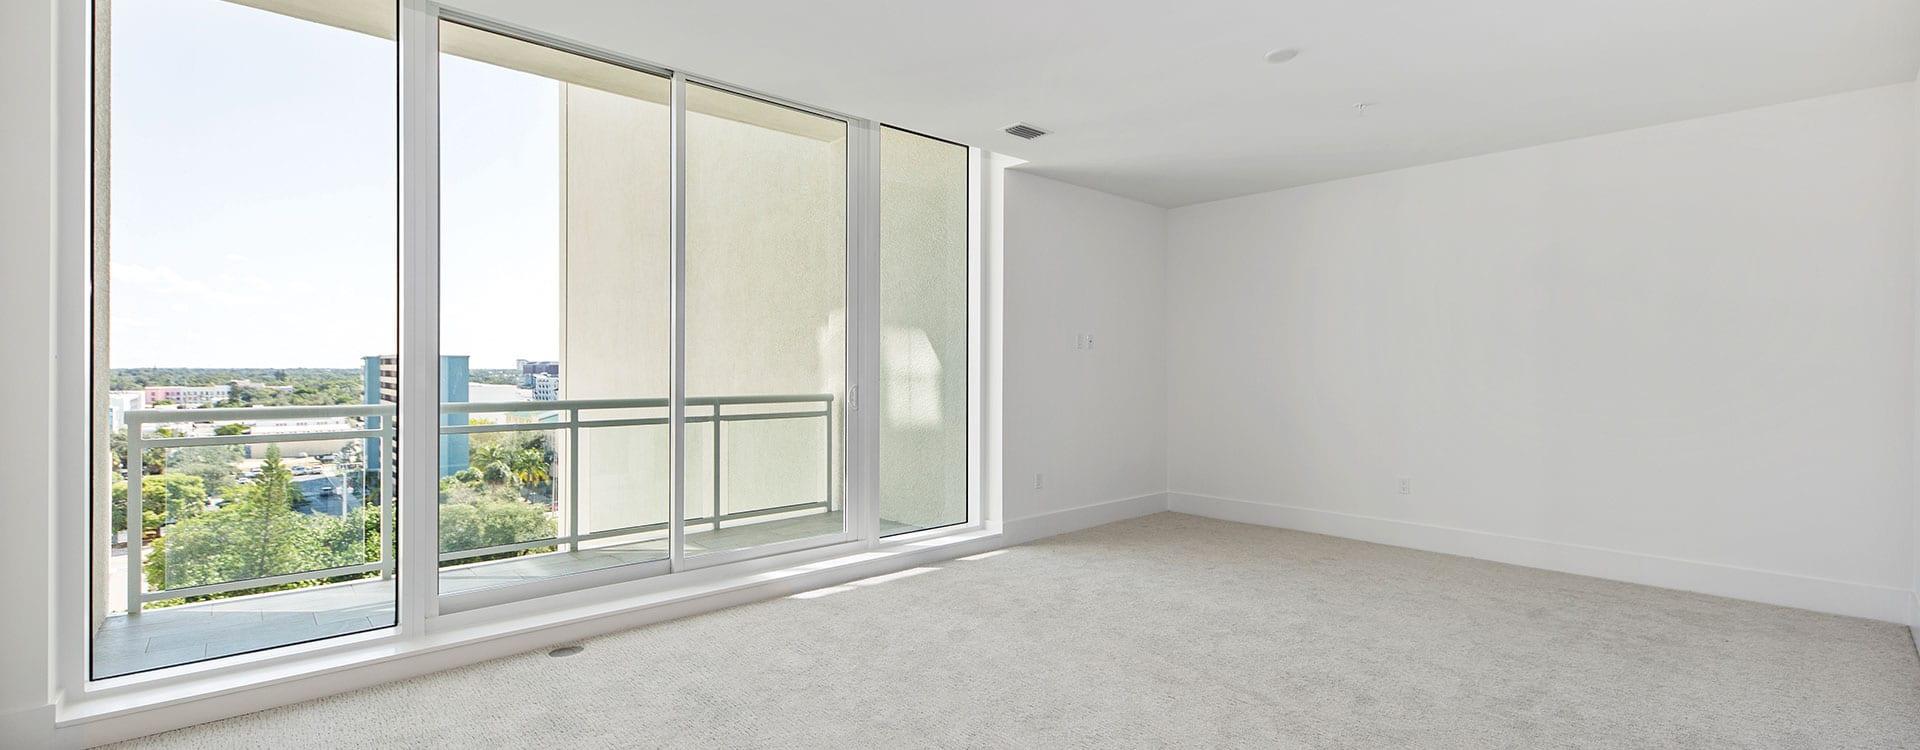 BLVD Residence 903 Bedroom